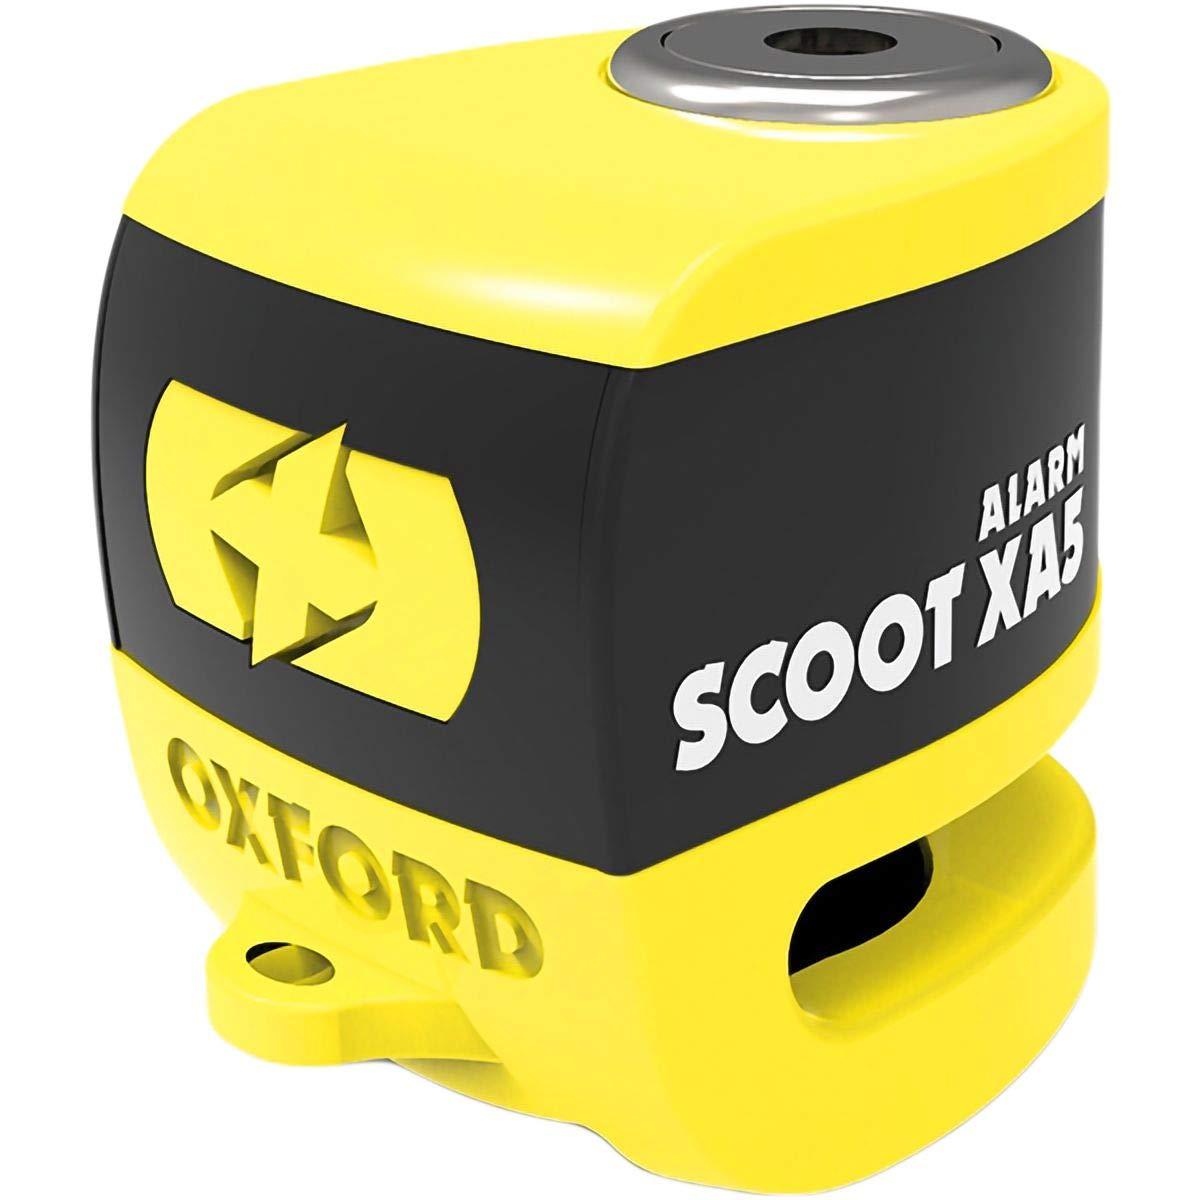 Oxford LK287 Yellow//Black Scoot XA5 Alarm Disc Lock